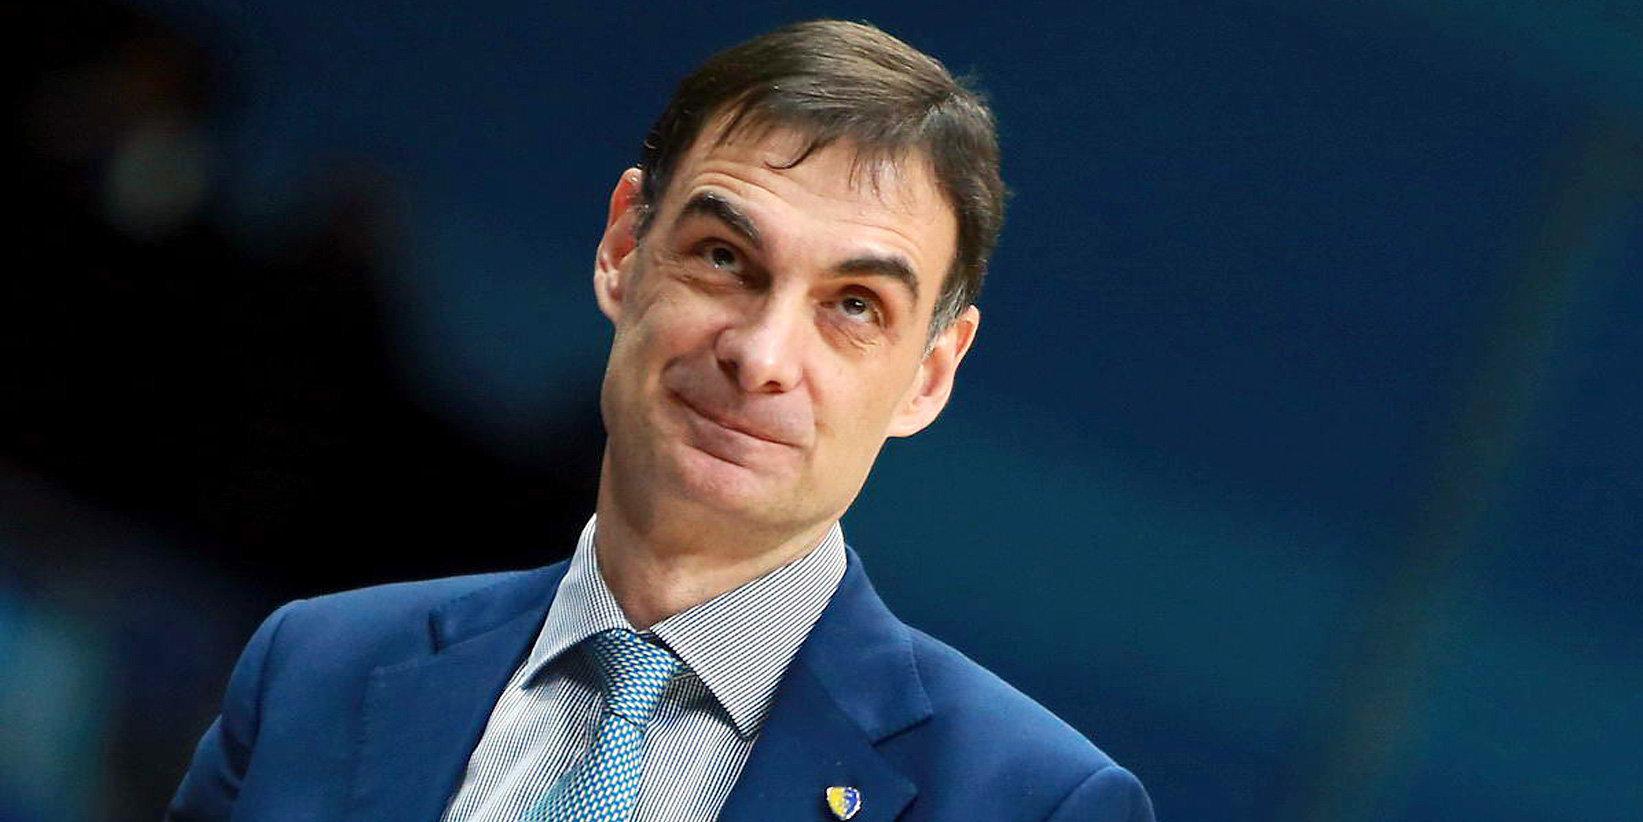 Георгиос Барцокас: «Дорогого стоит победить такую команду, как «Панатинаикос»